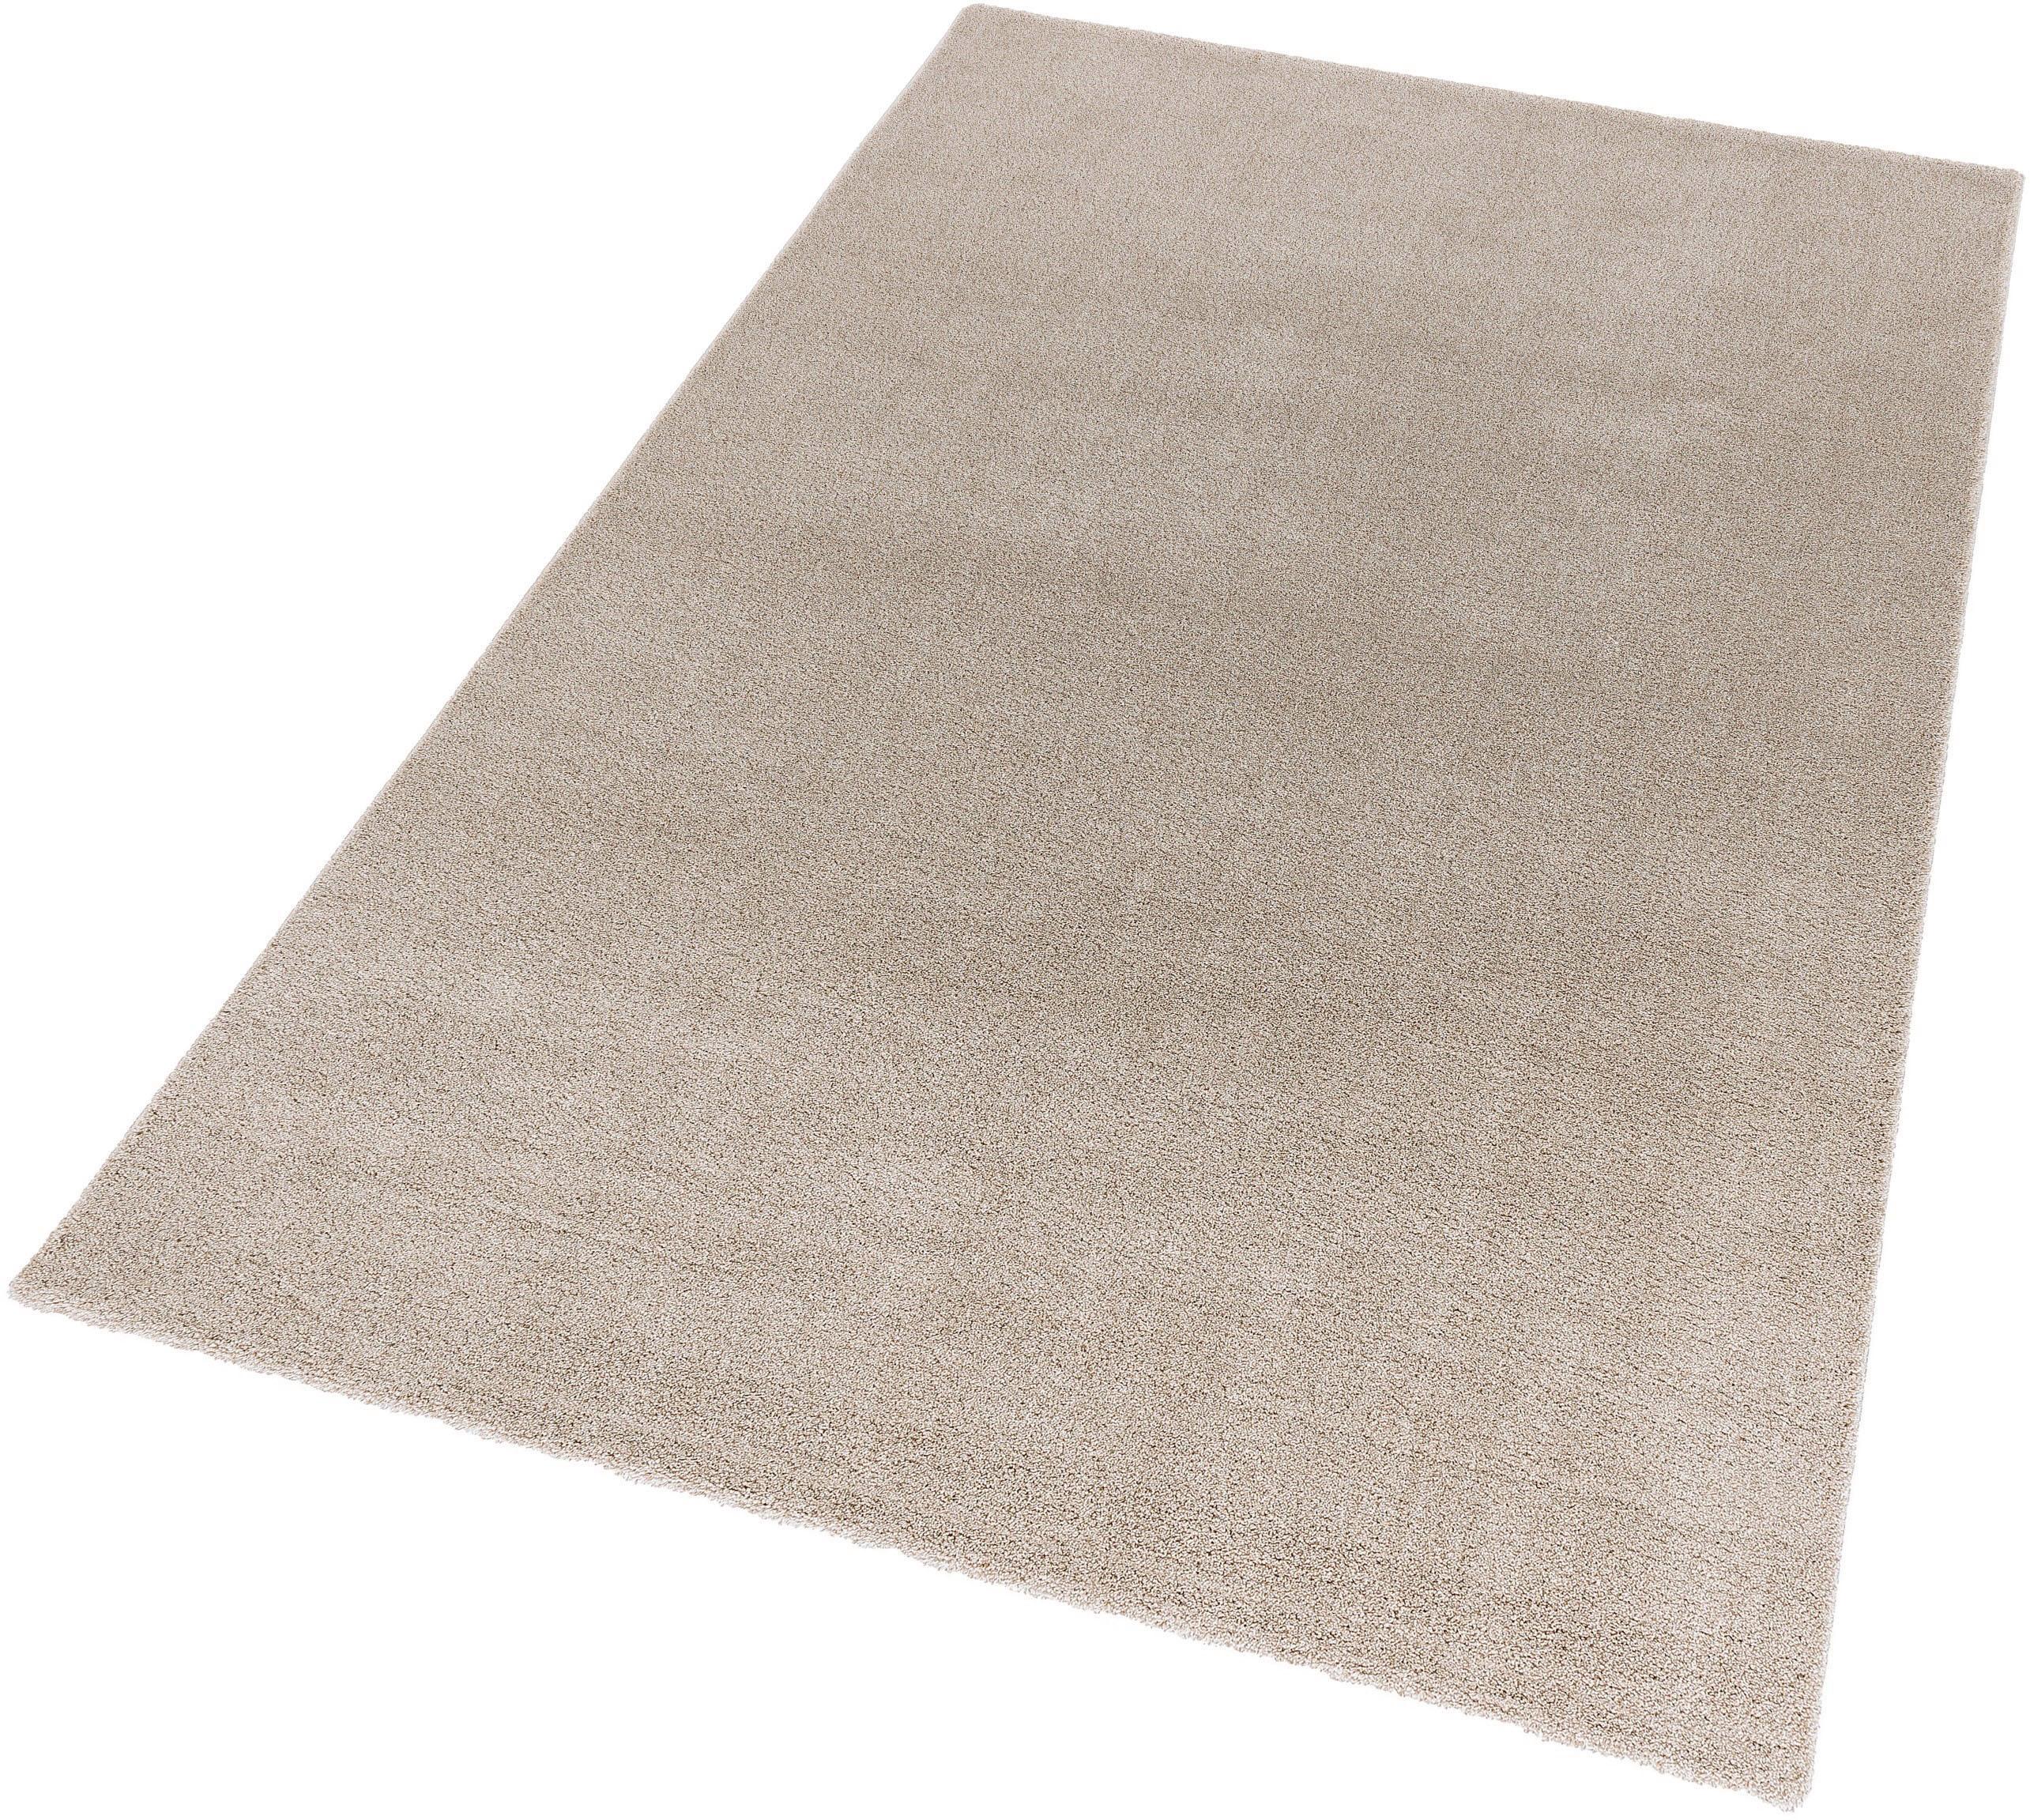 Teppich Savona 180 ASTRA rechteckig Höhe 20 mm maschinell gewebt